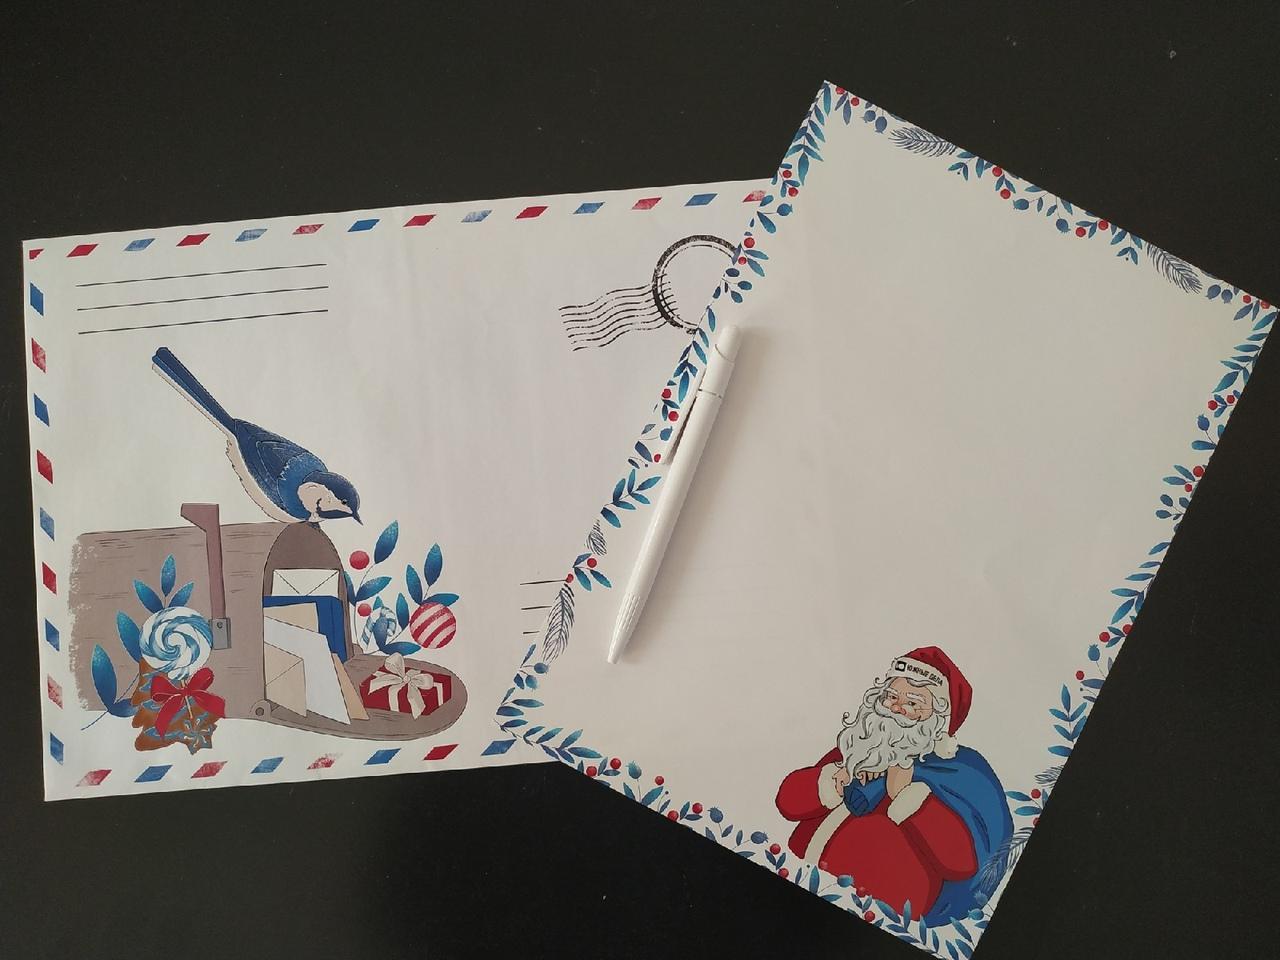 Почта Деда Мороза открылась в Краснодаре